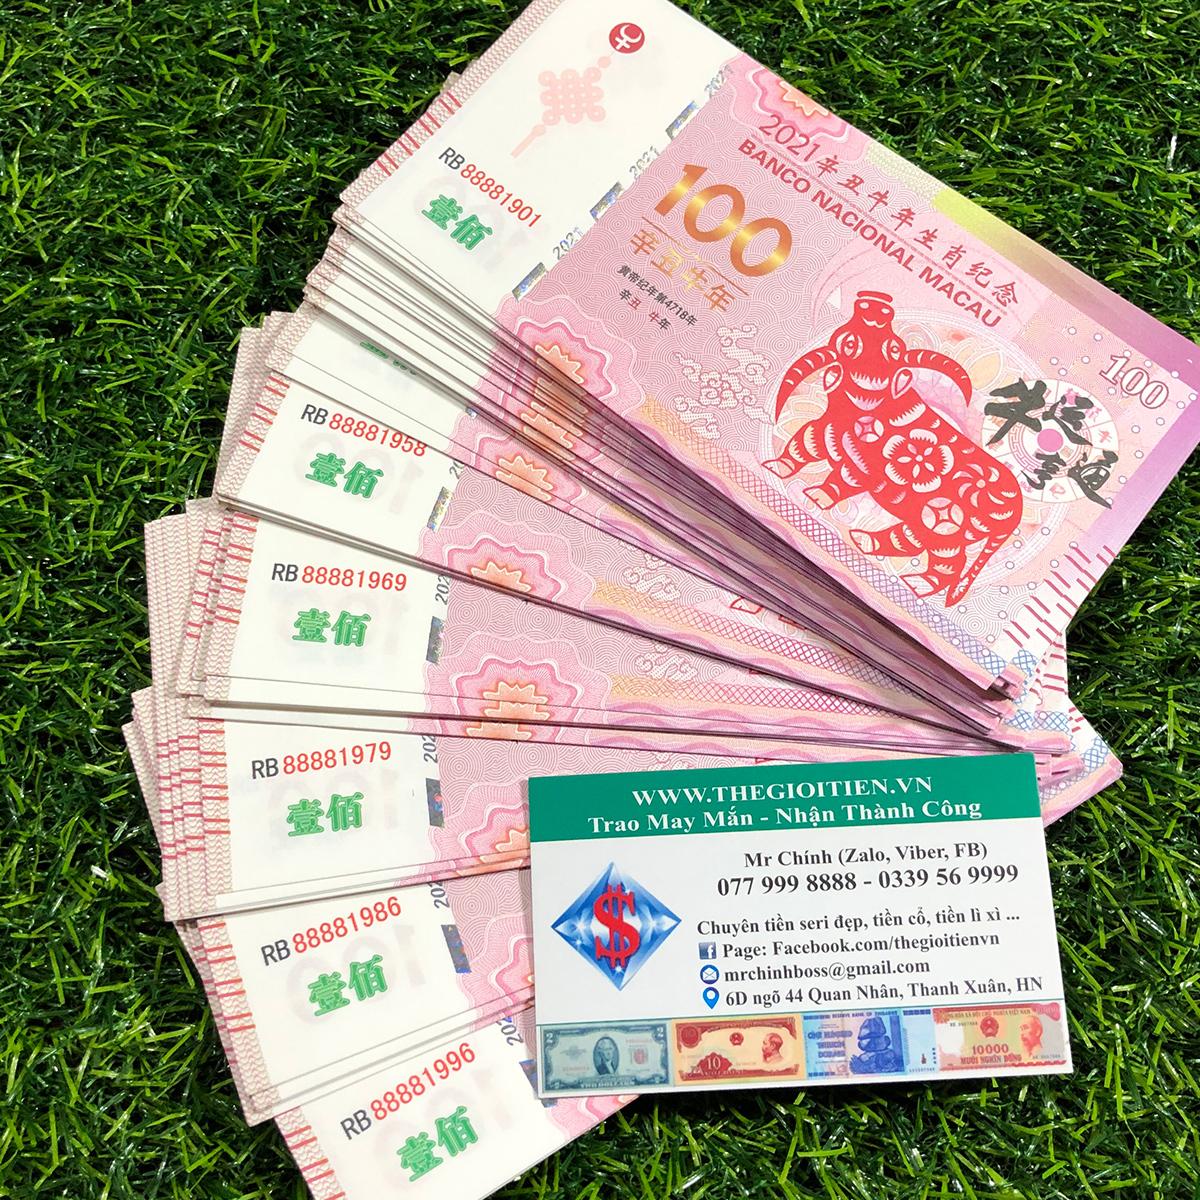 tiền trâu macao số năm sinh